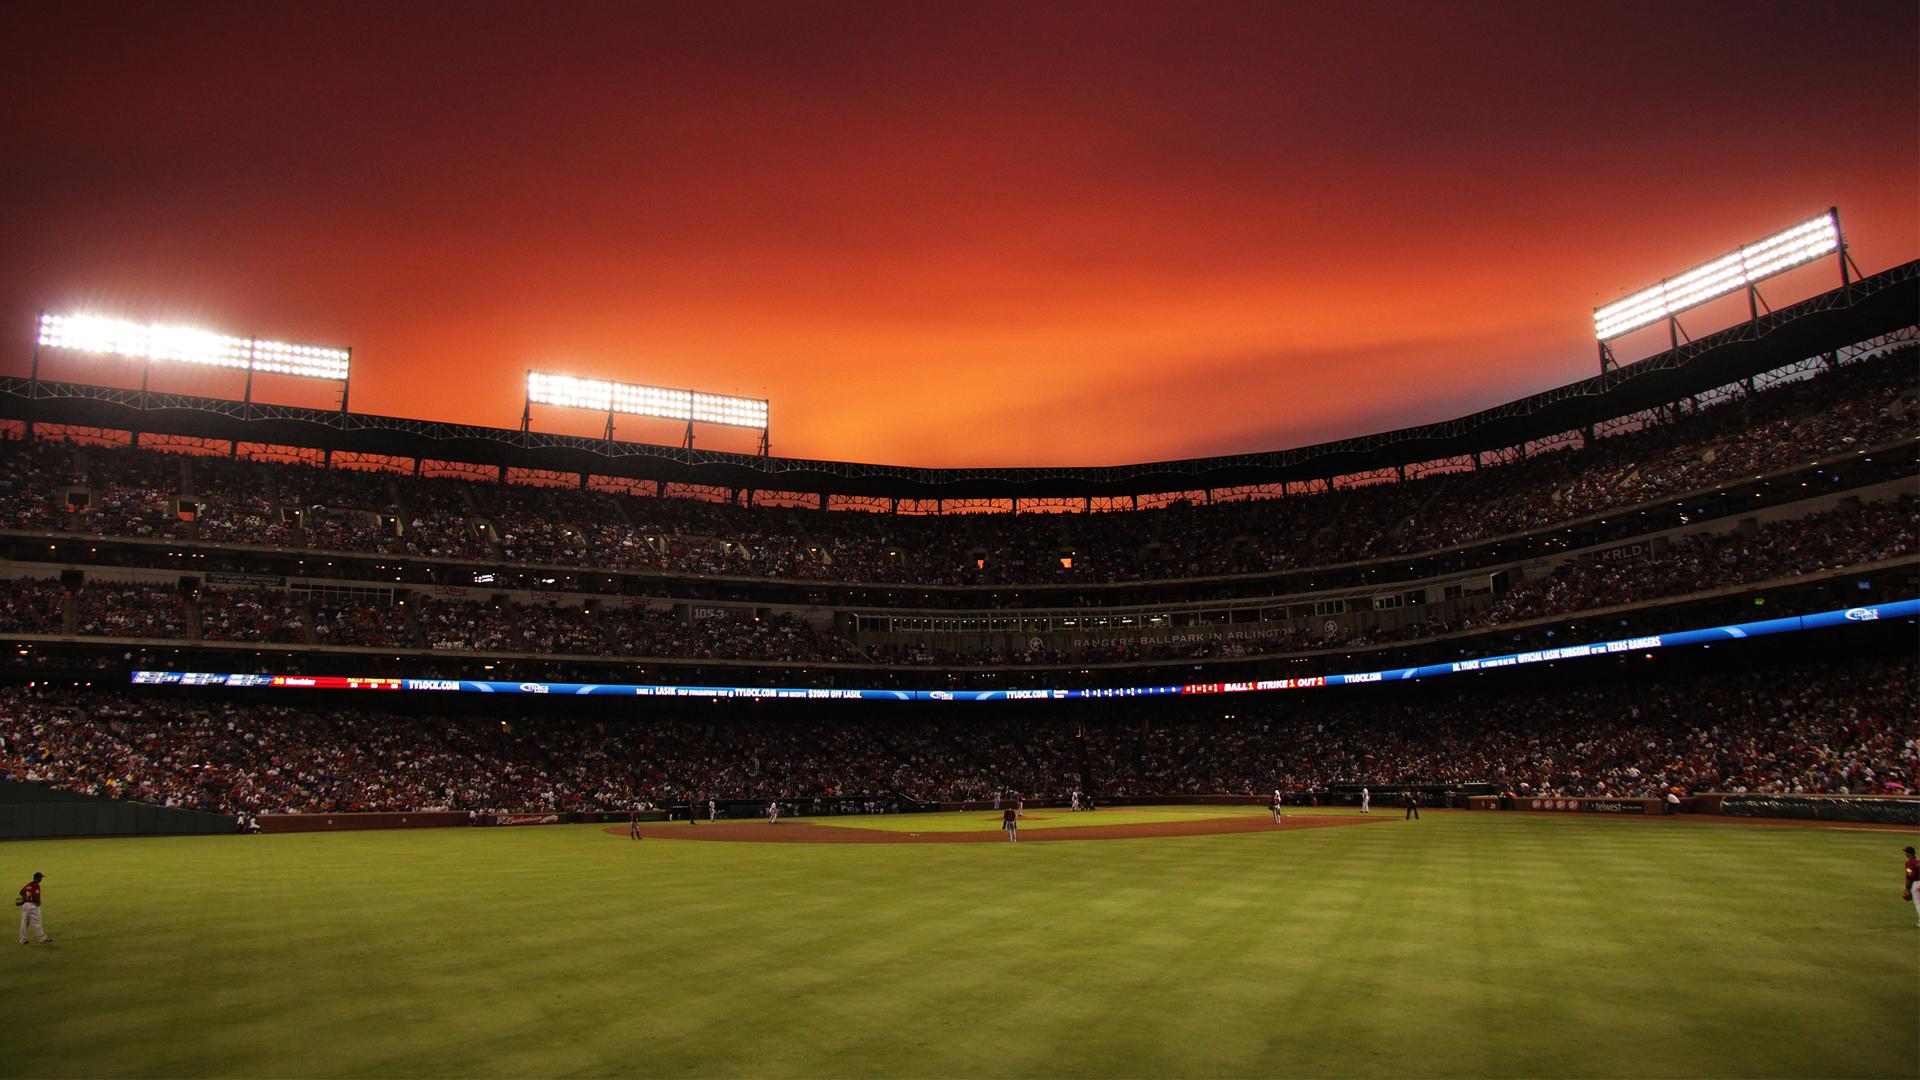 HD Baseball Field Wallpaper